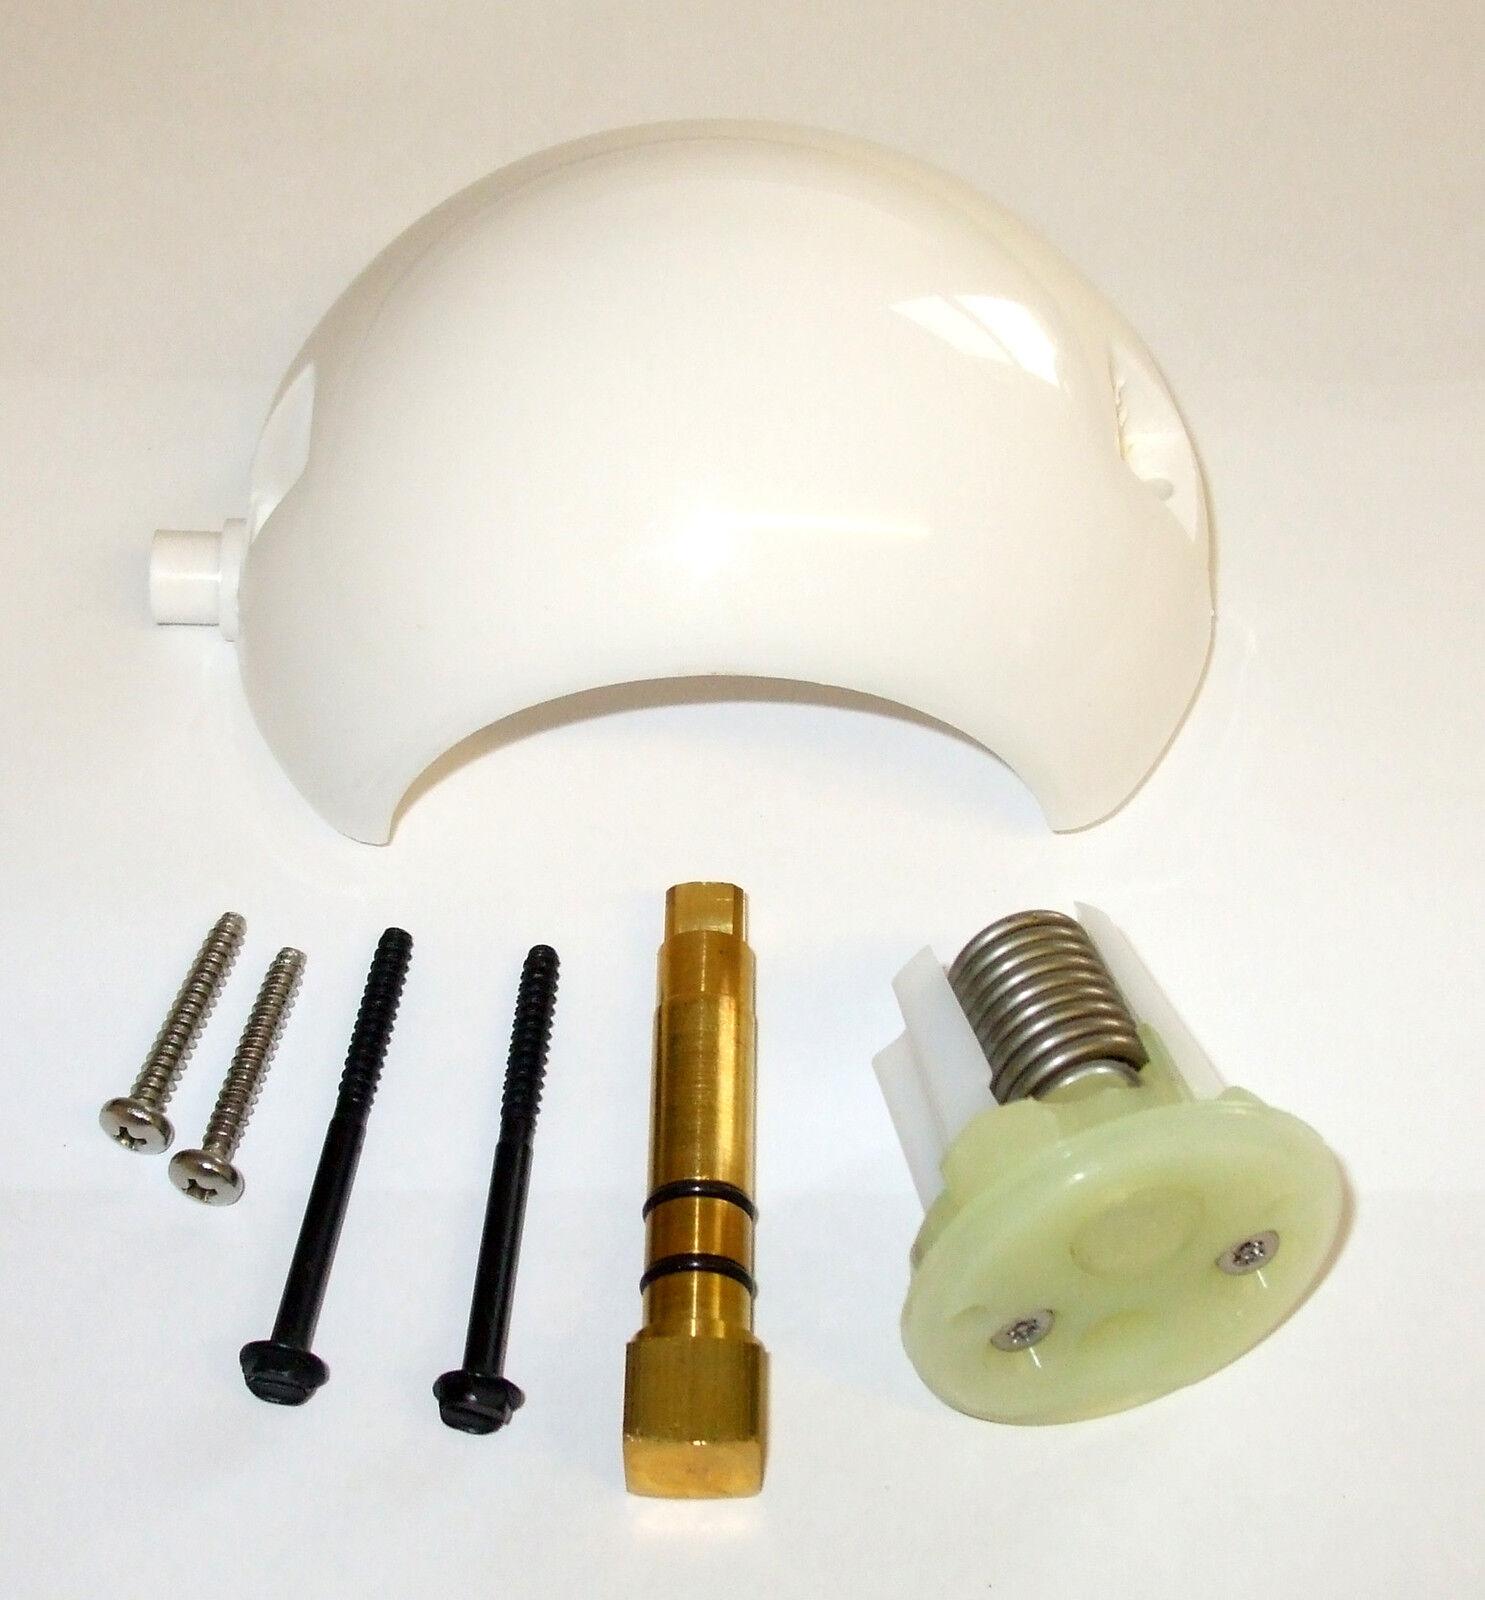 Mansfield Travler / Vacuflush Wc - Flush Flush Flush Kugel Ersatzteil Set 385318162 902279